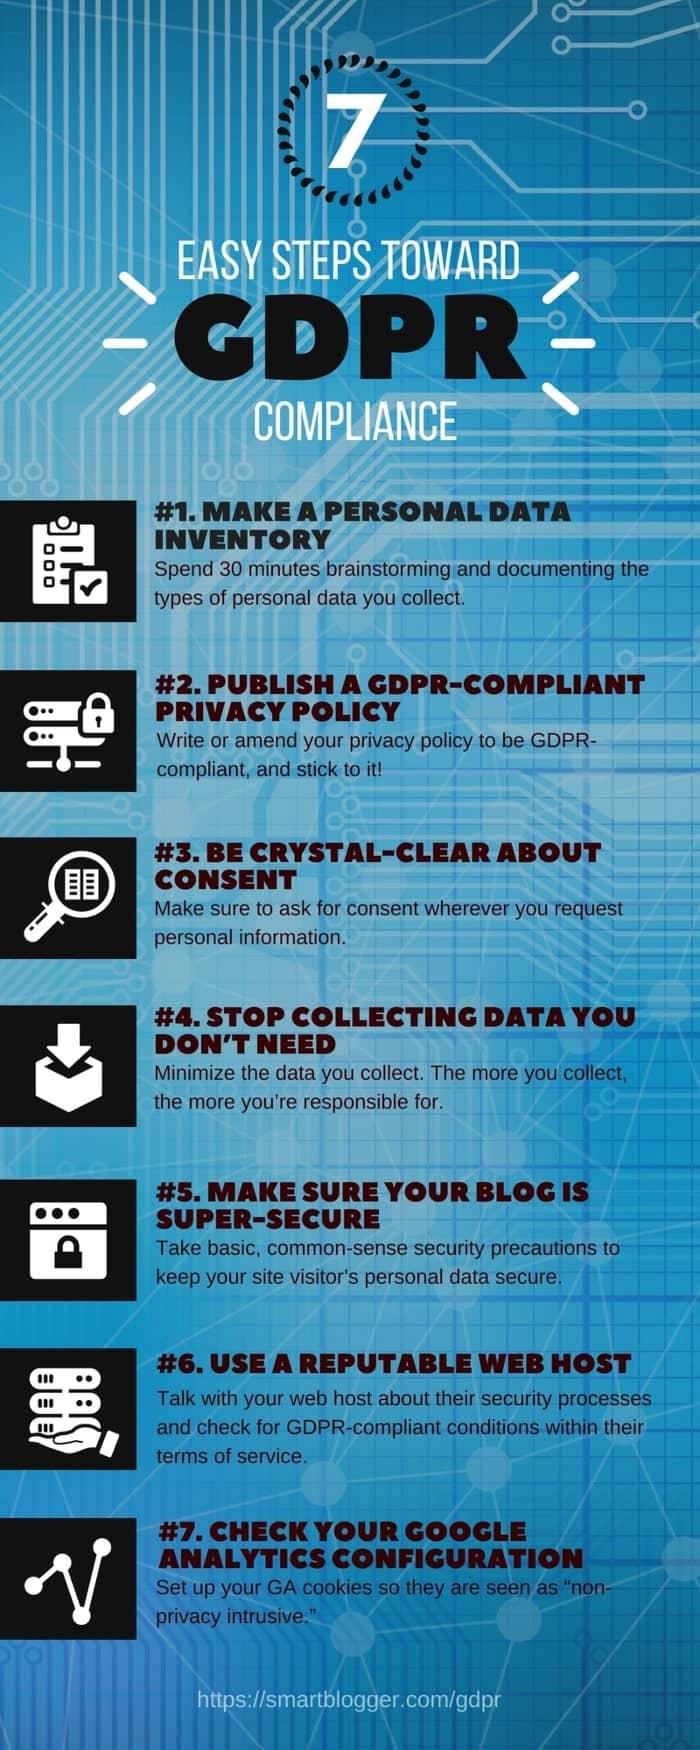 Seven Easy Steps Toward GDPR Compliance